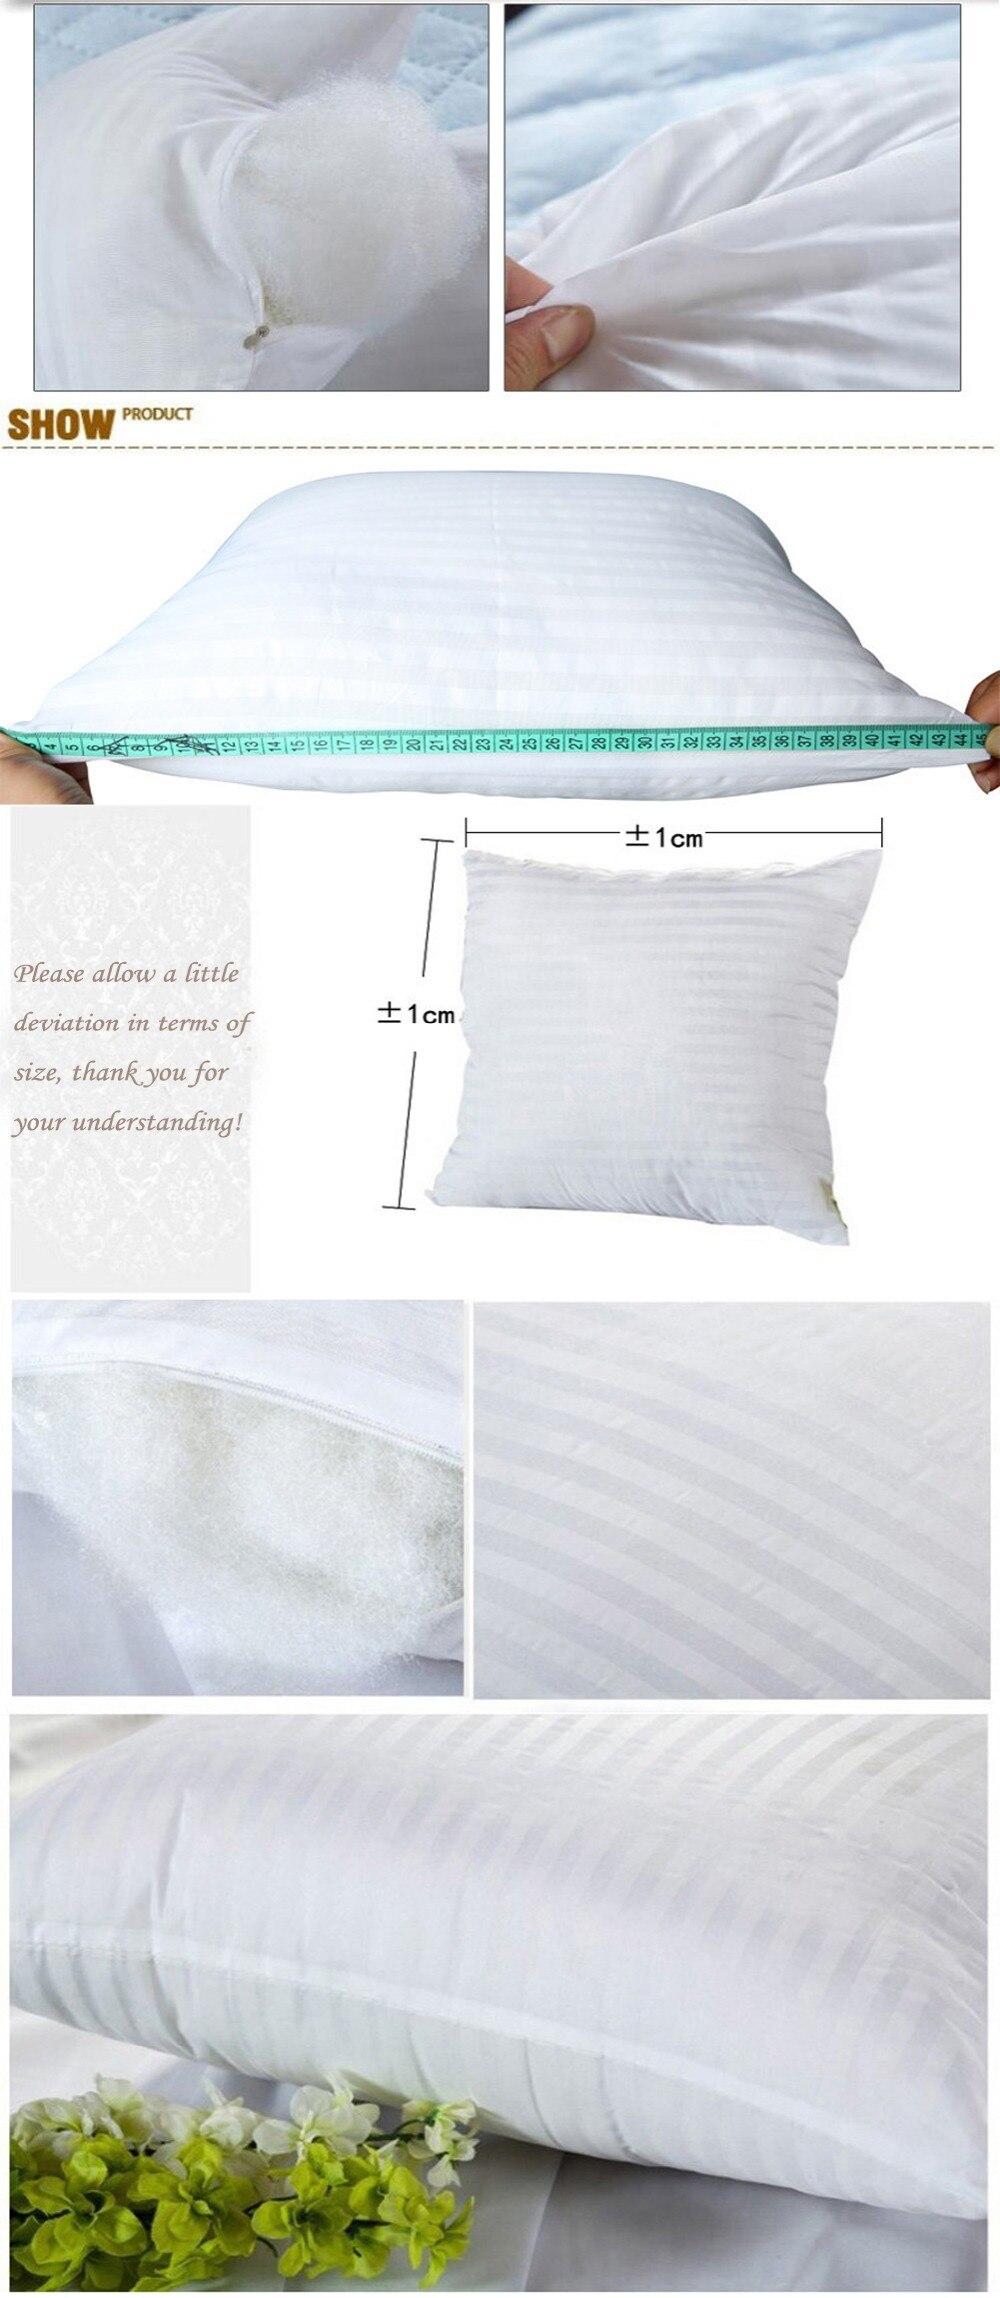 HTB1aNL6cXGWBuNjy0Fbq6z4sXXaY Meijuner Square White Cushion Pillow interior Insert Soft PP Cotton for Home Decor Sofa Chair Throw Pillow Core Seat Cushion